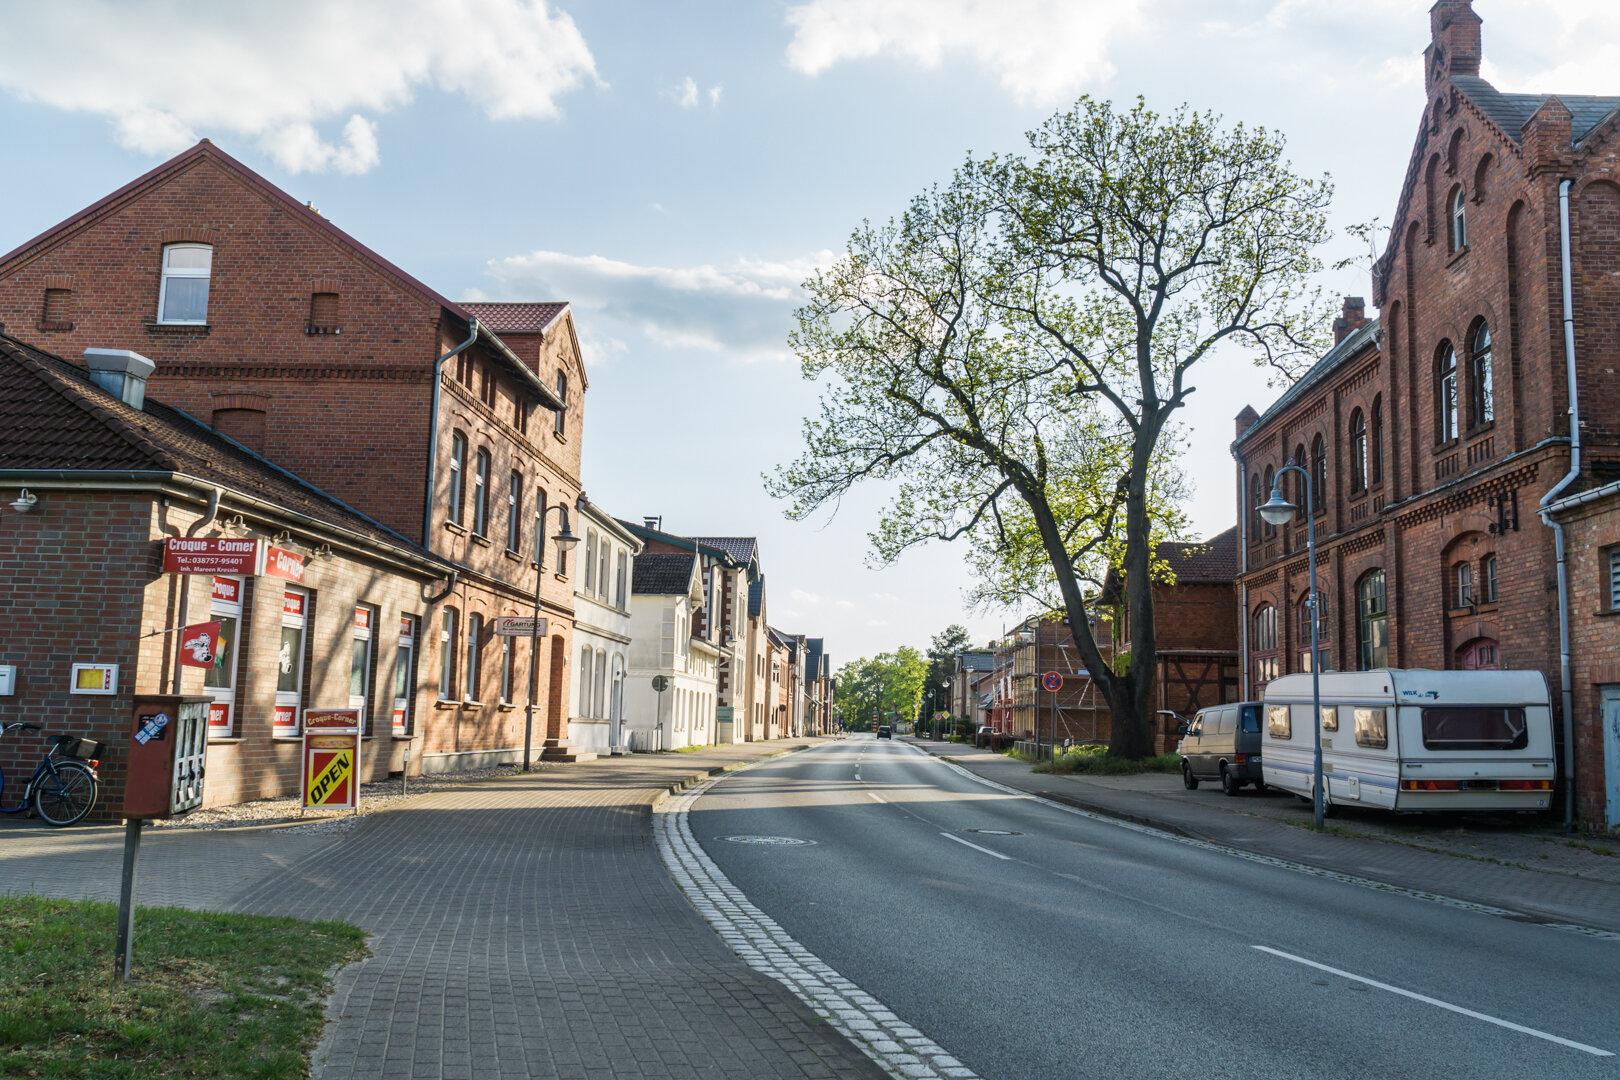 Ludwigsluster_Str._rechts_alte_Feuerwehr_links_Corner